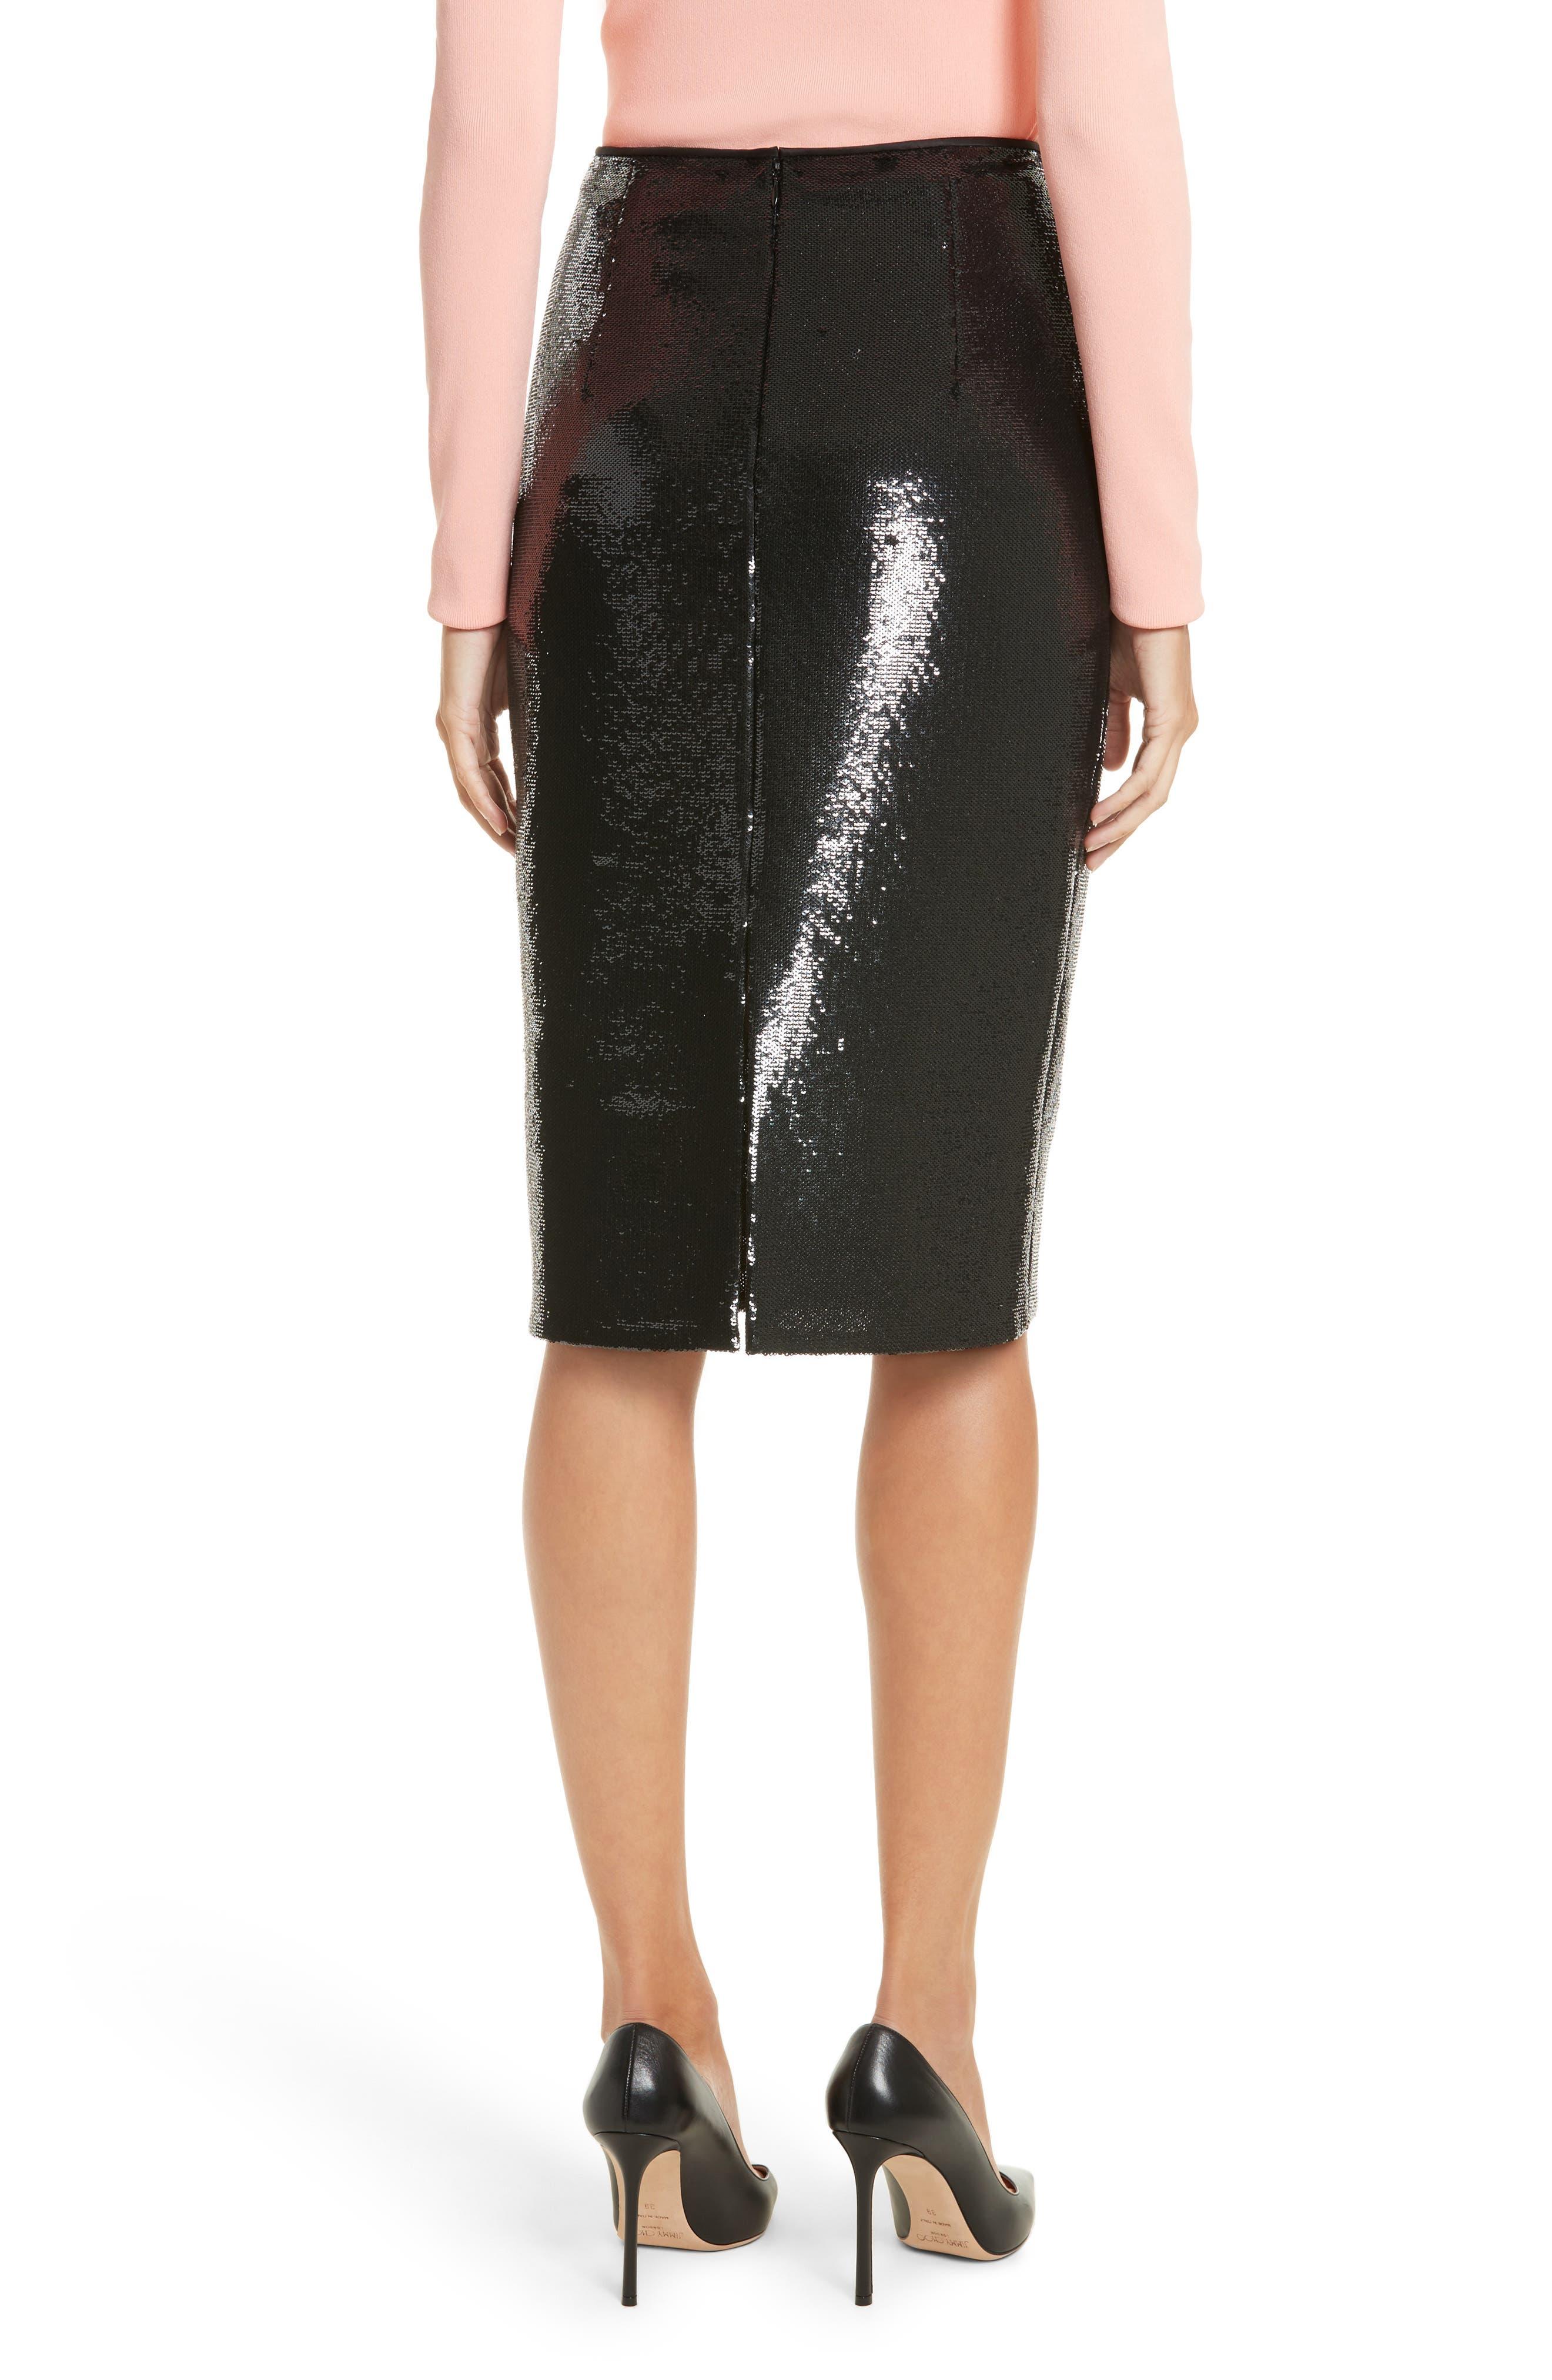 Diane von Furstenberg Sequin Pencil Skirt,                             Alternate thumbnail 2, color,                             001